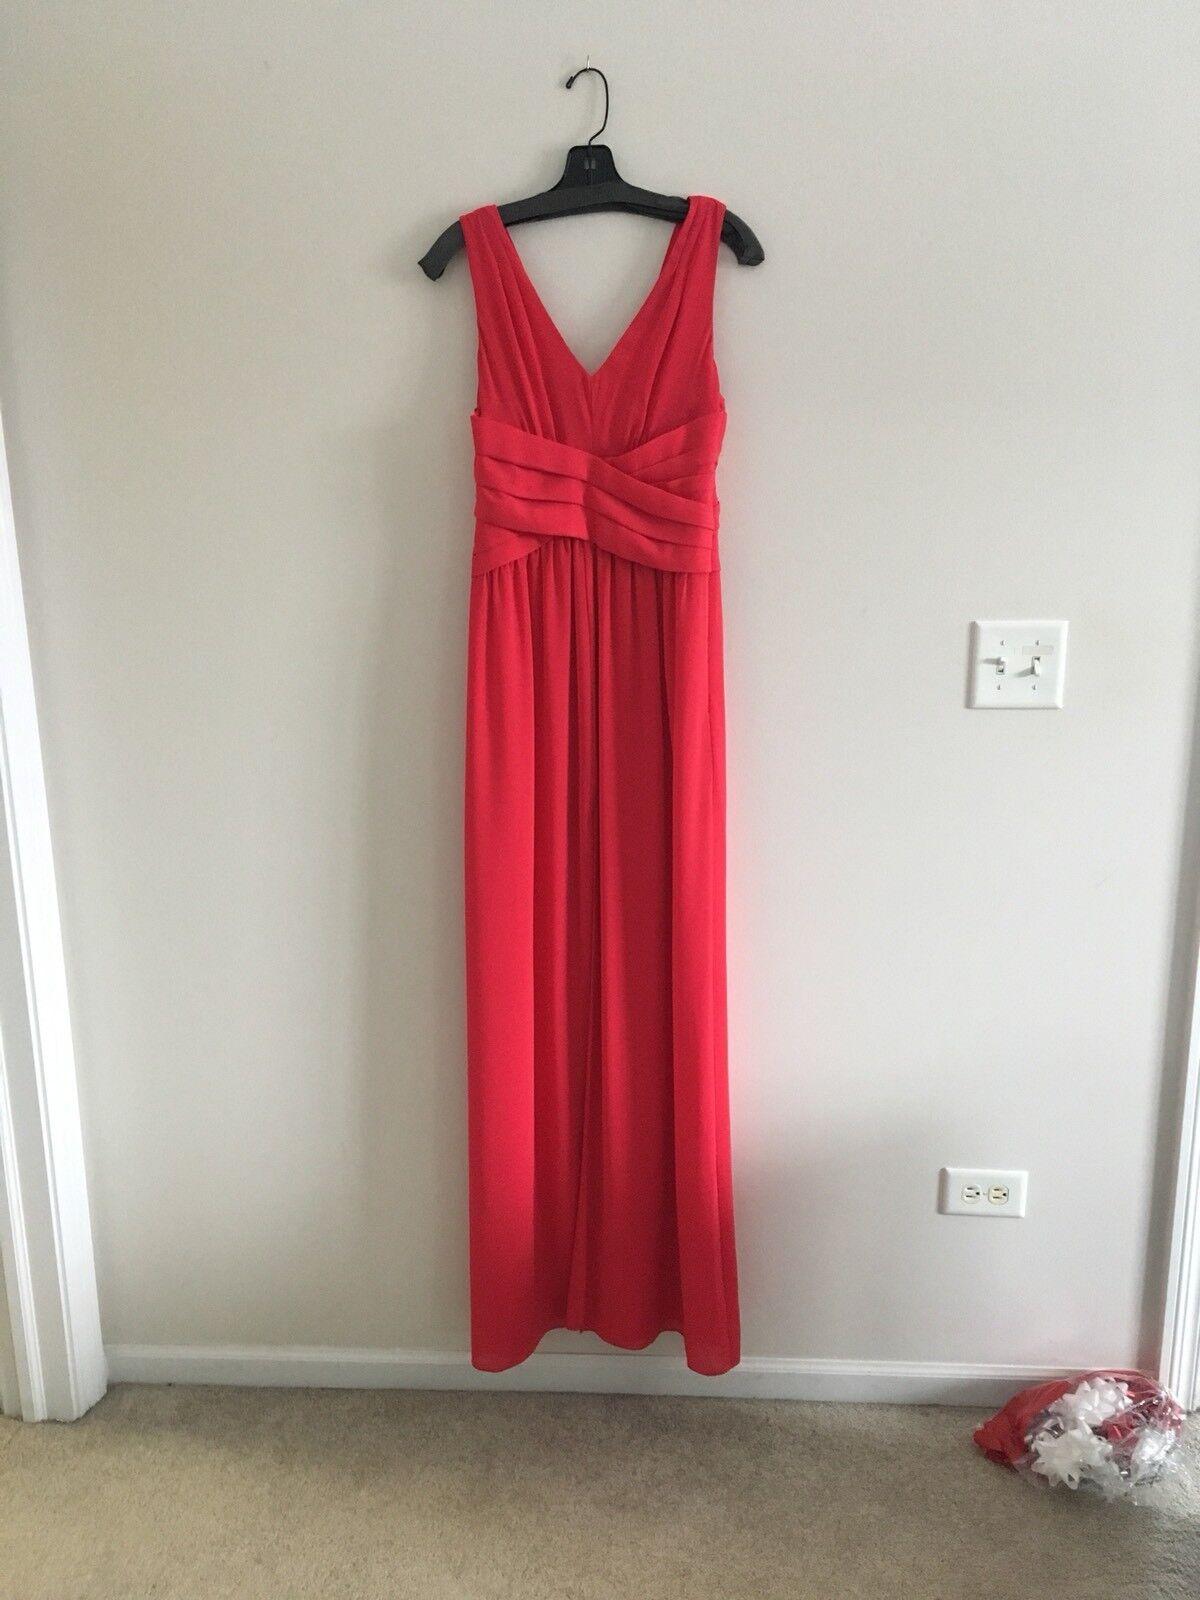 NWT- Parker schwarz damen Glacier rot Shutter Pleat Evening Dress Gown, sz 4